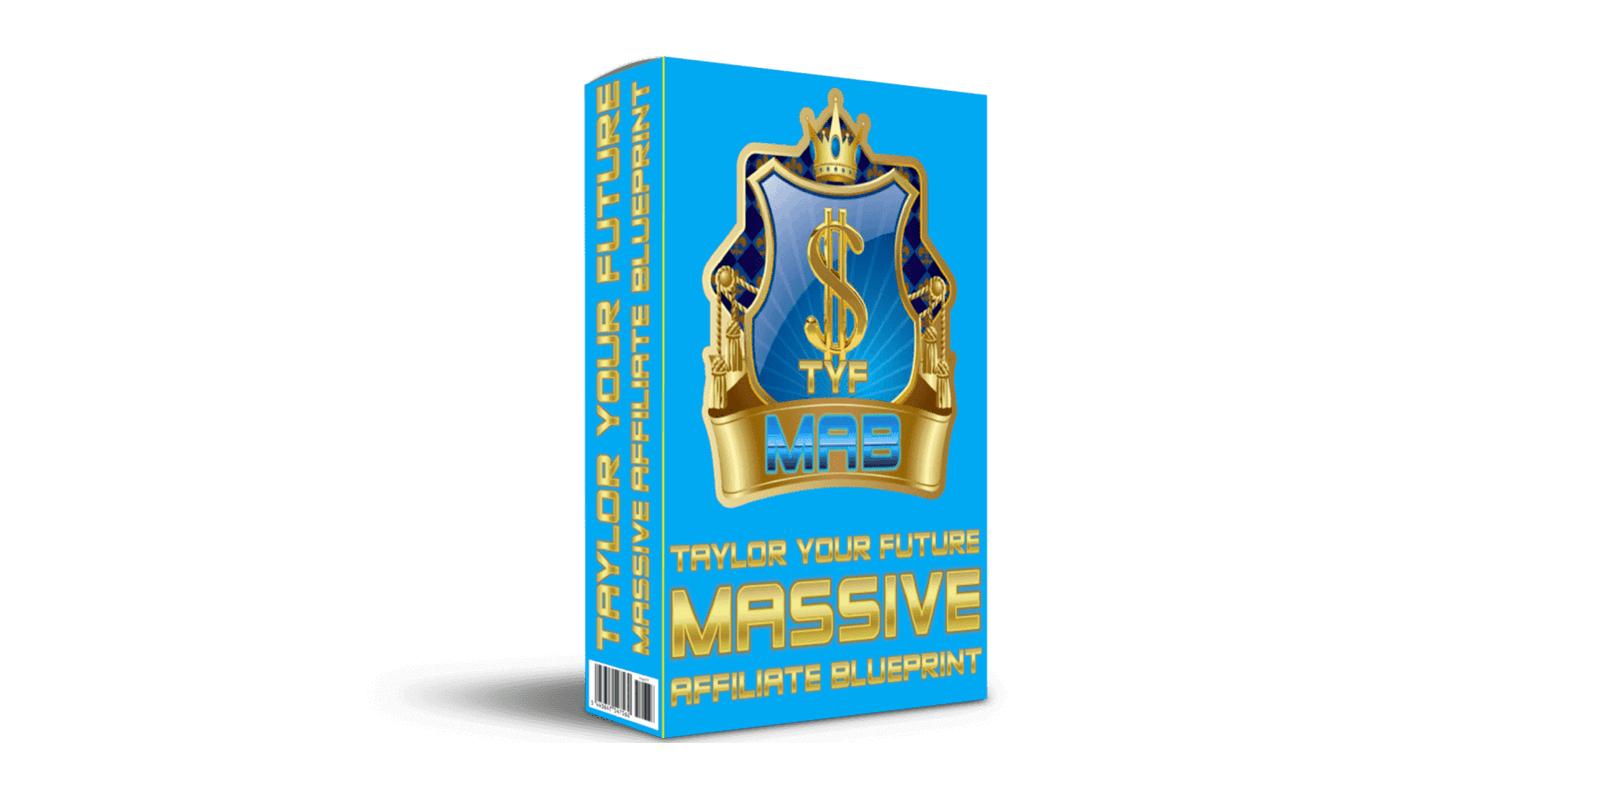 Massive Affiliate blueprint review